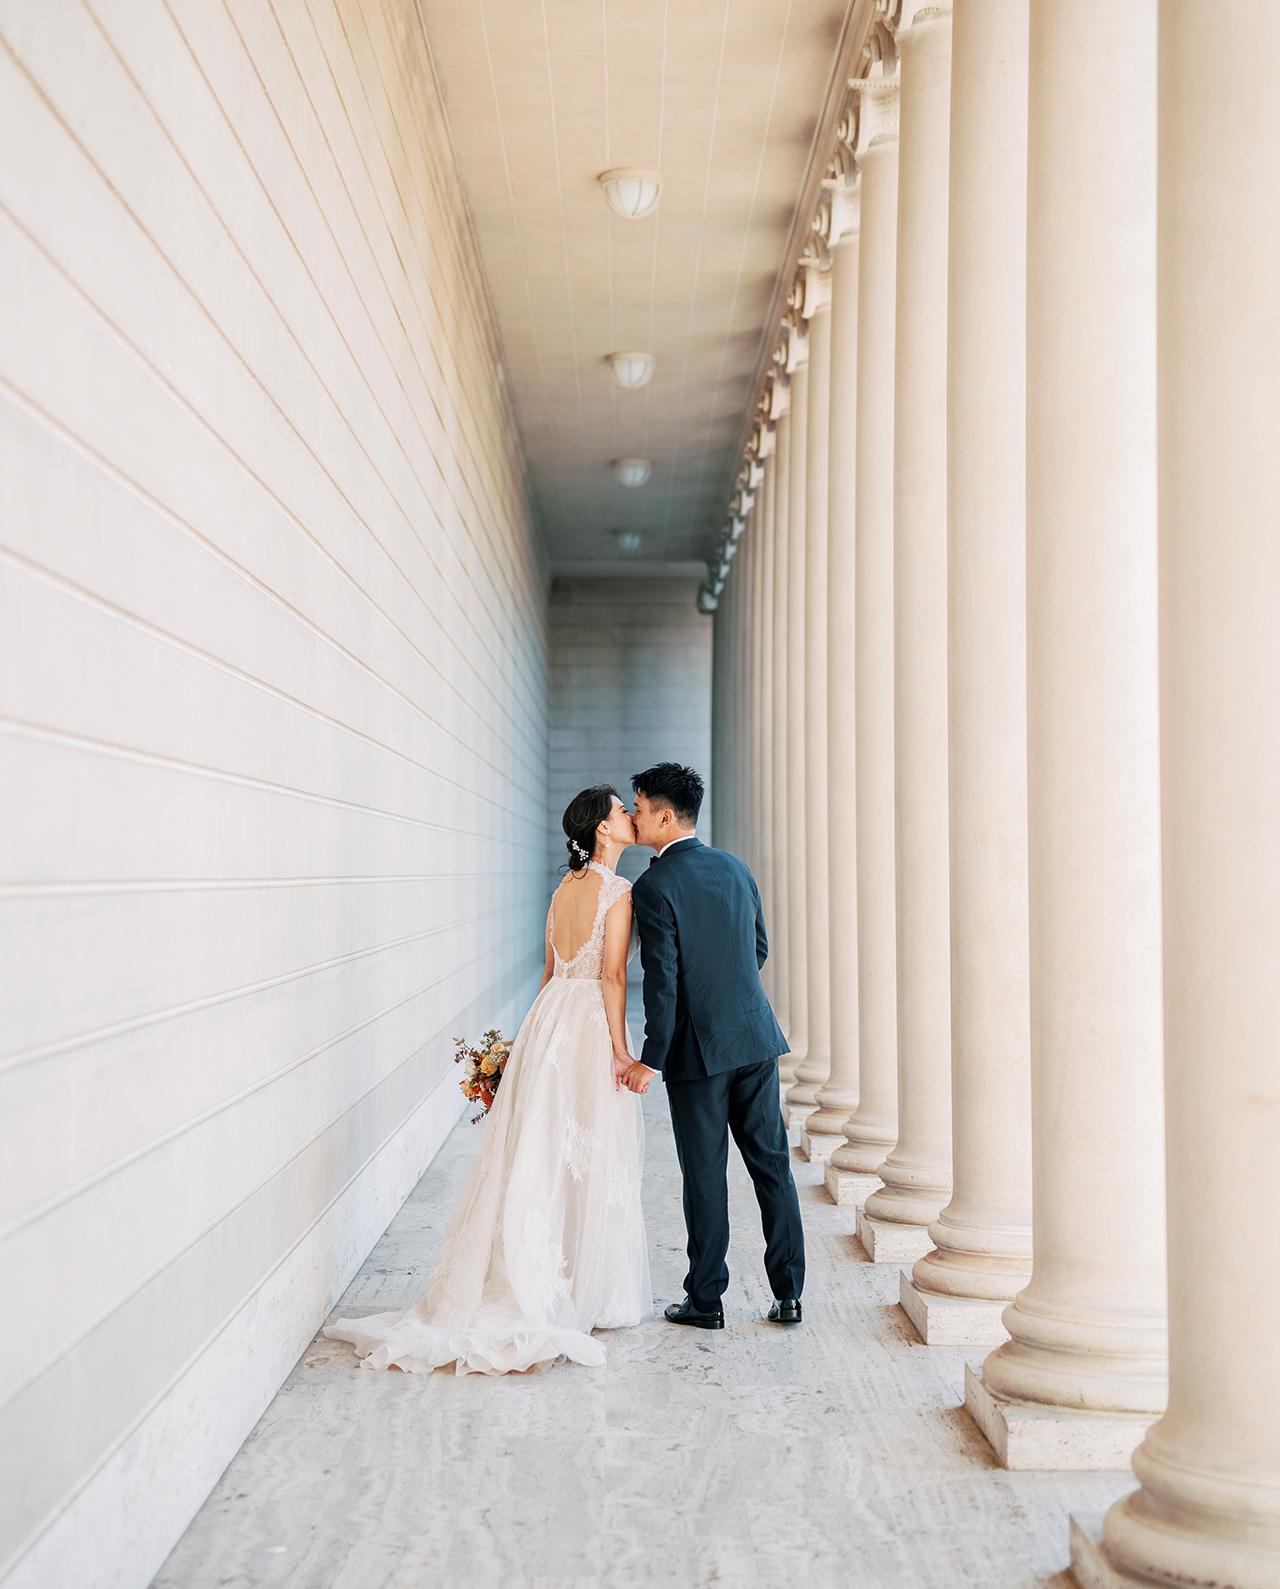 wedding couple kiss near museum pillars